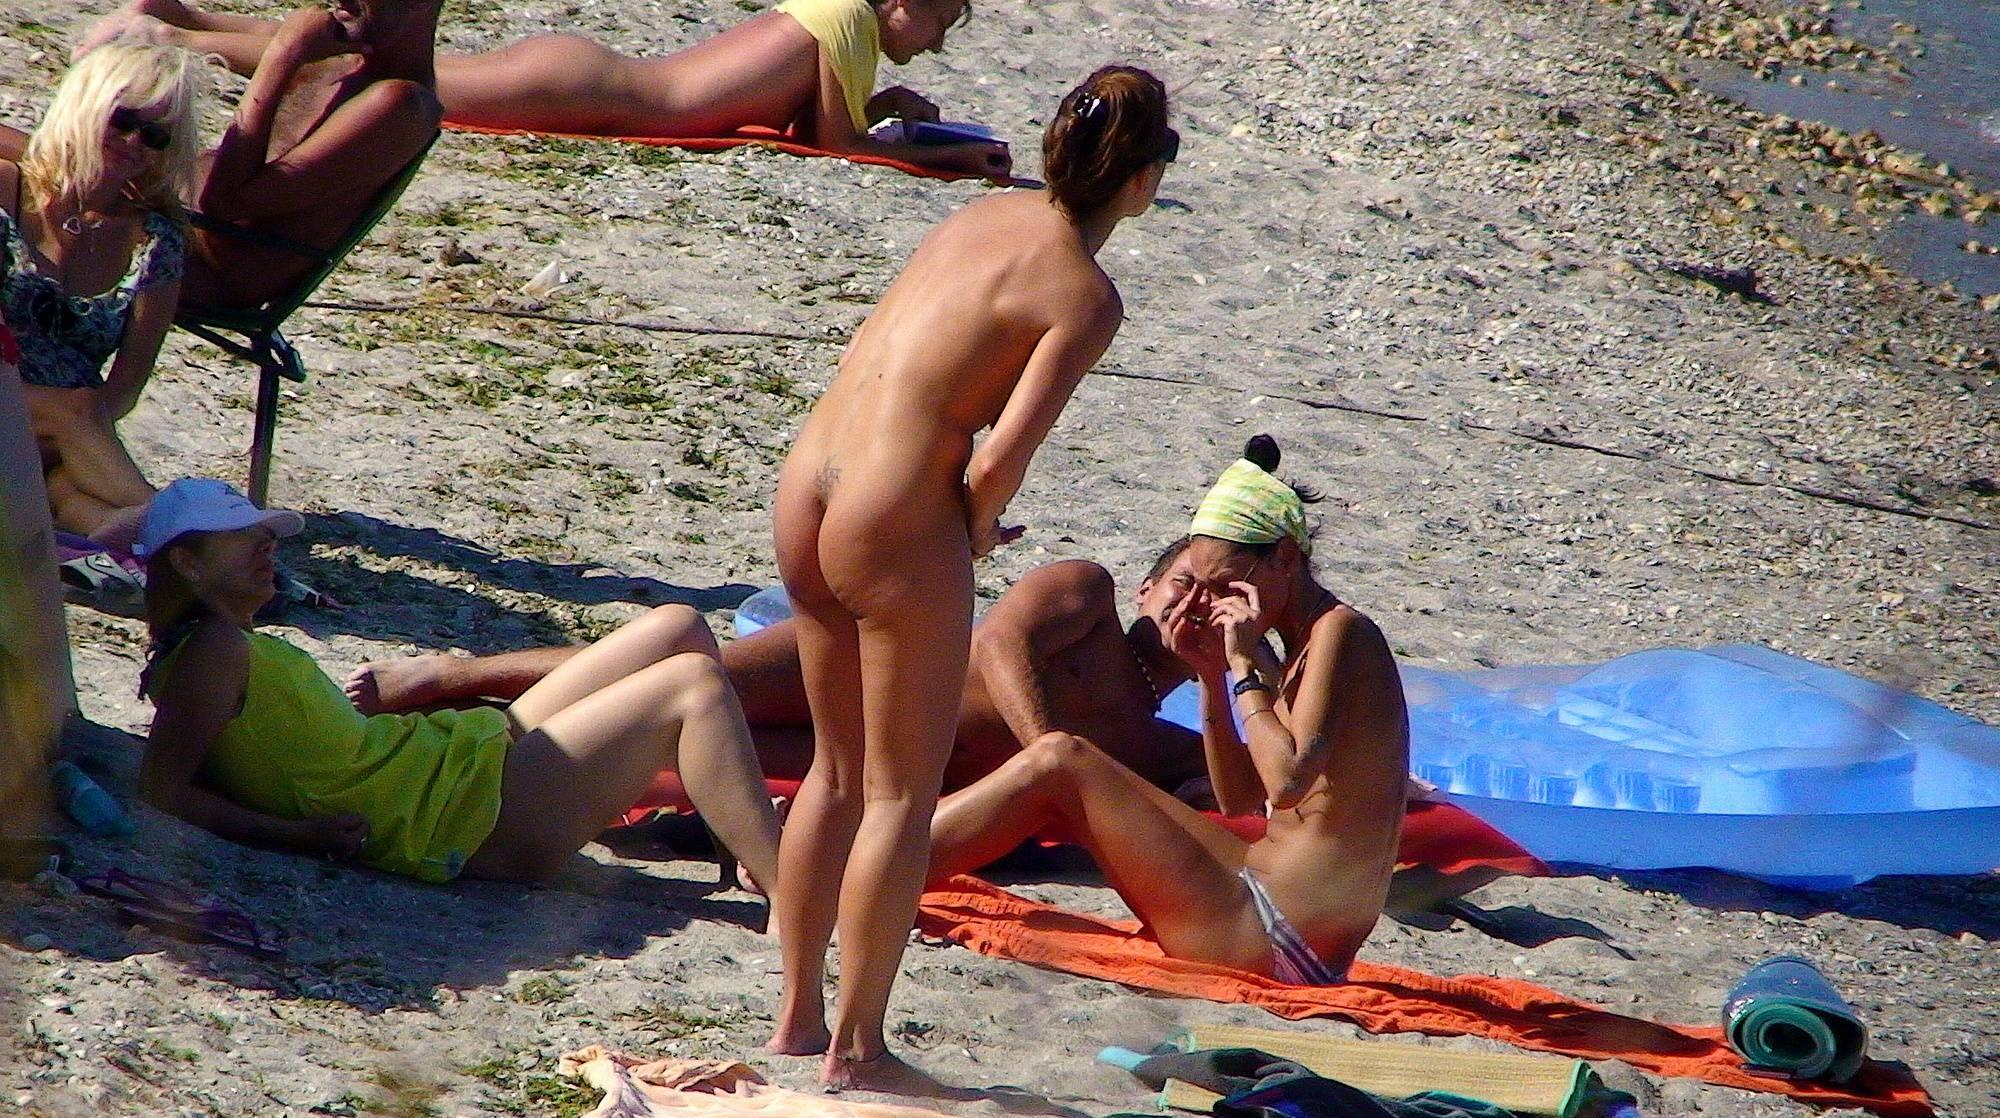 Nudist Pictures Romanian Shore Sands WS - 2